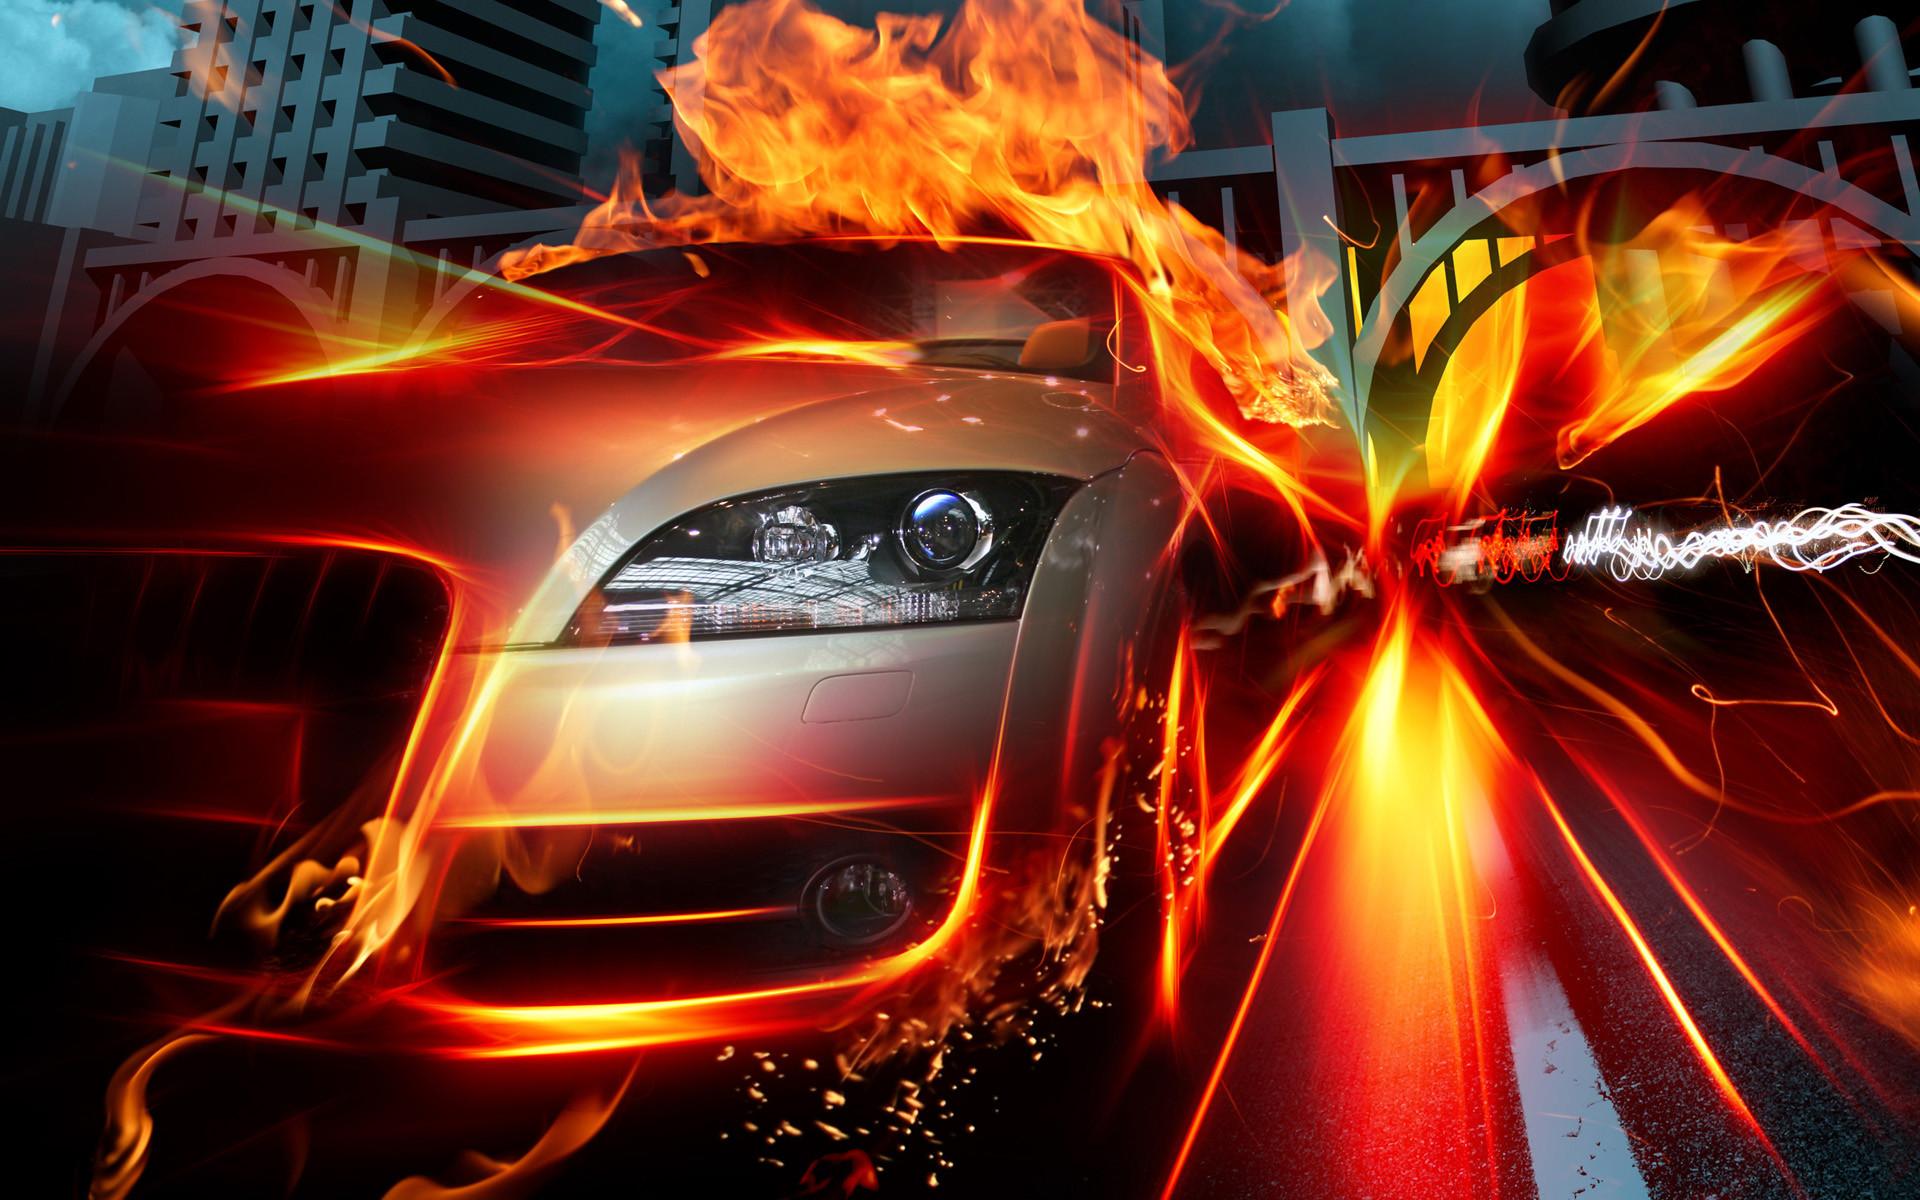 Fotografie - Manipulatie  Voertuig Vlam Ride Urban Fantasie Wallpaper